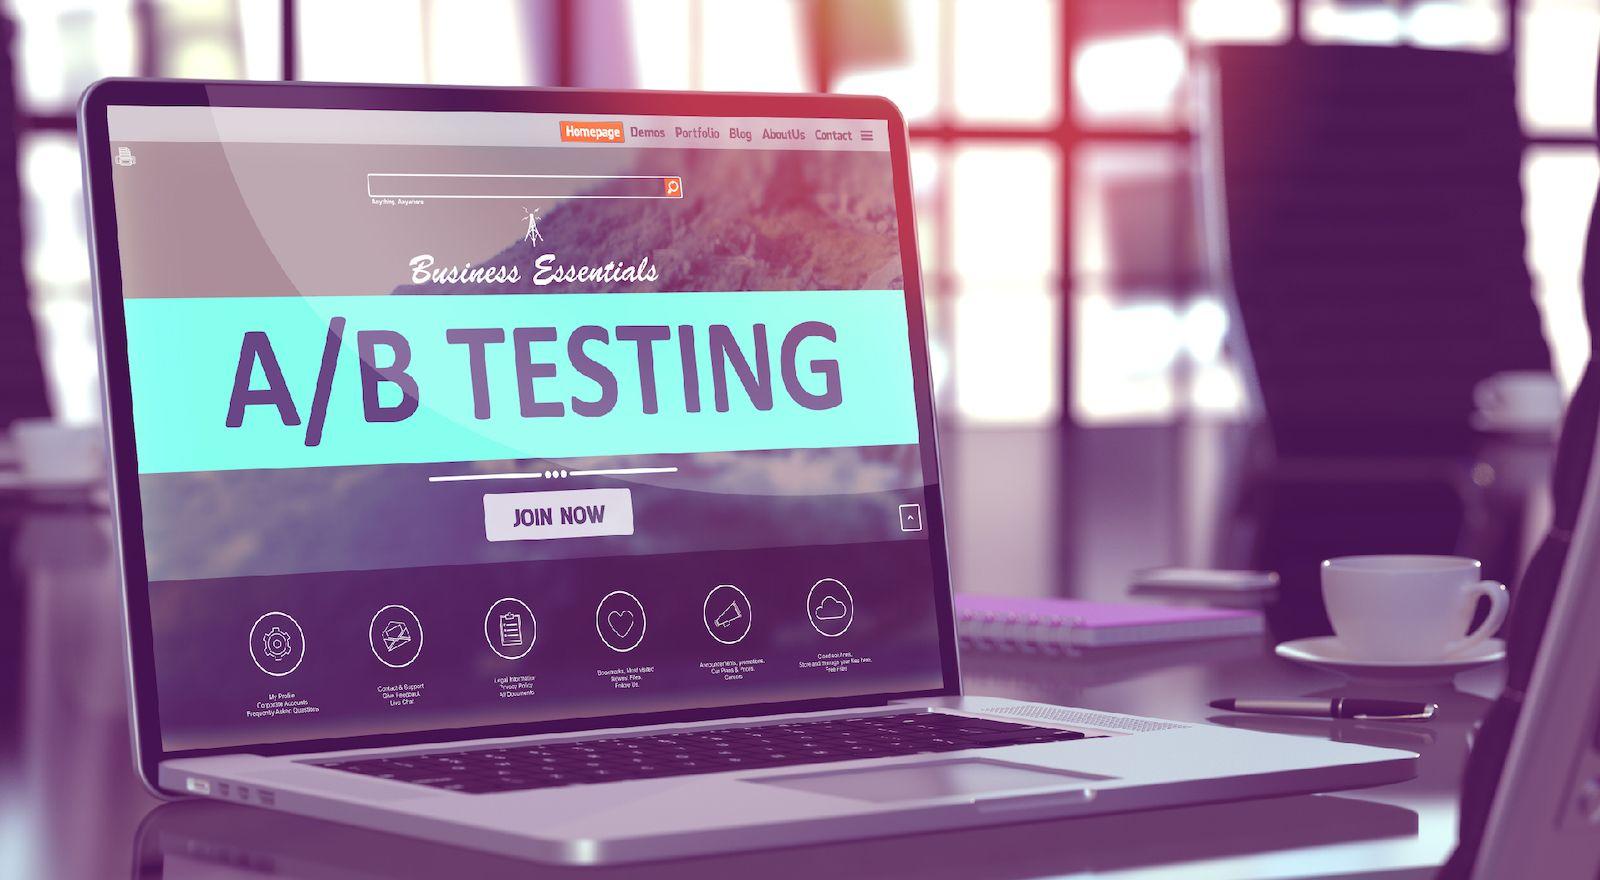 A/B test method for MVP validation